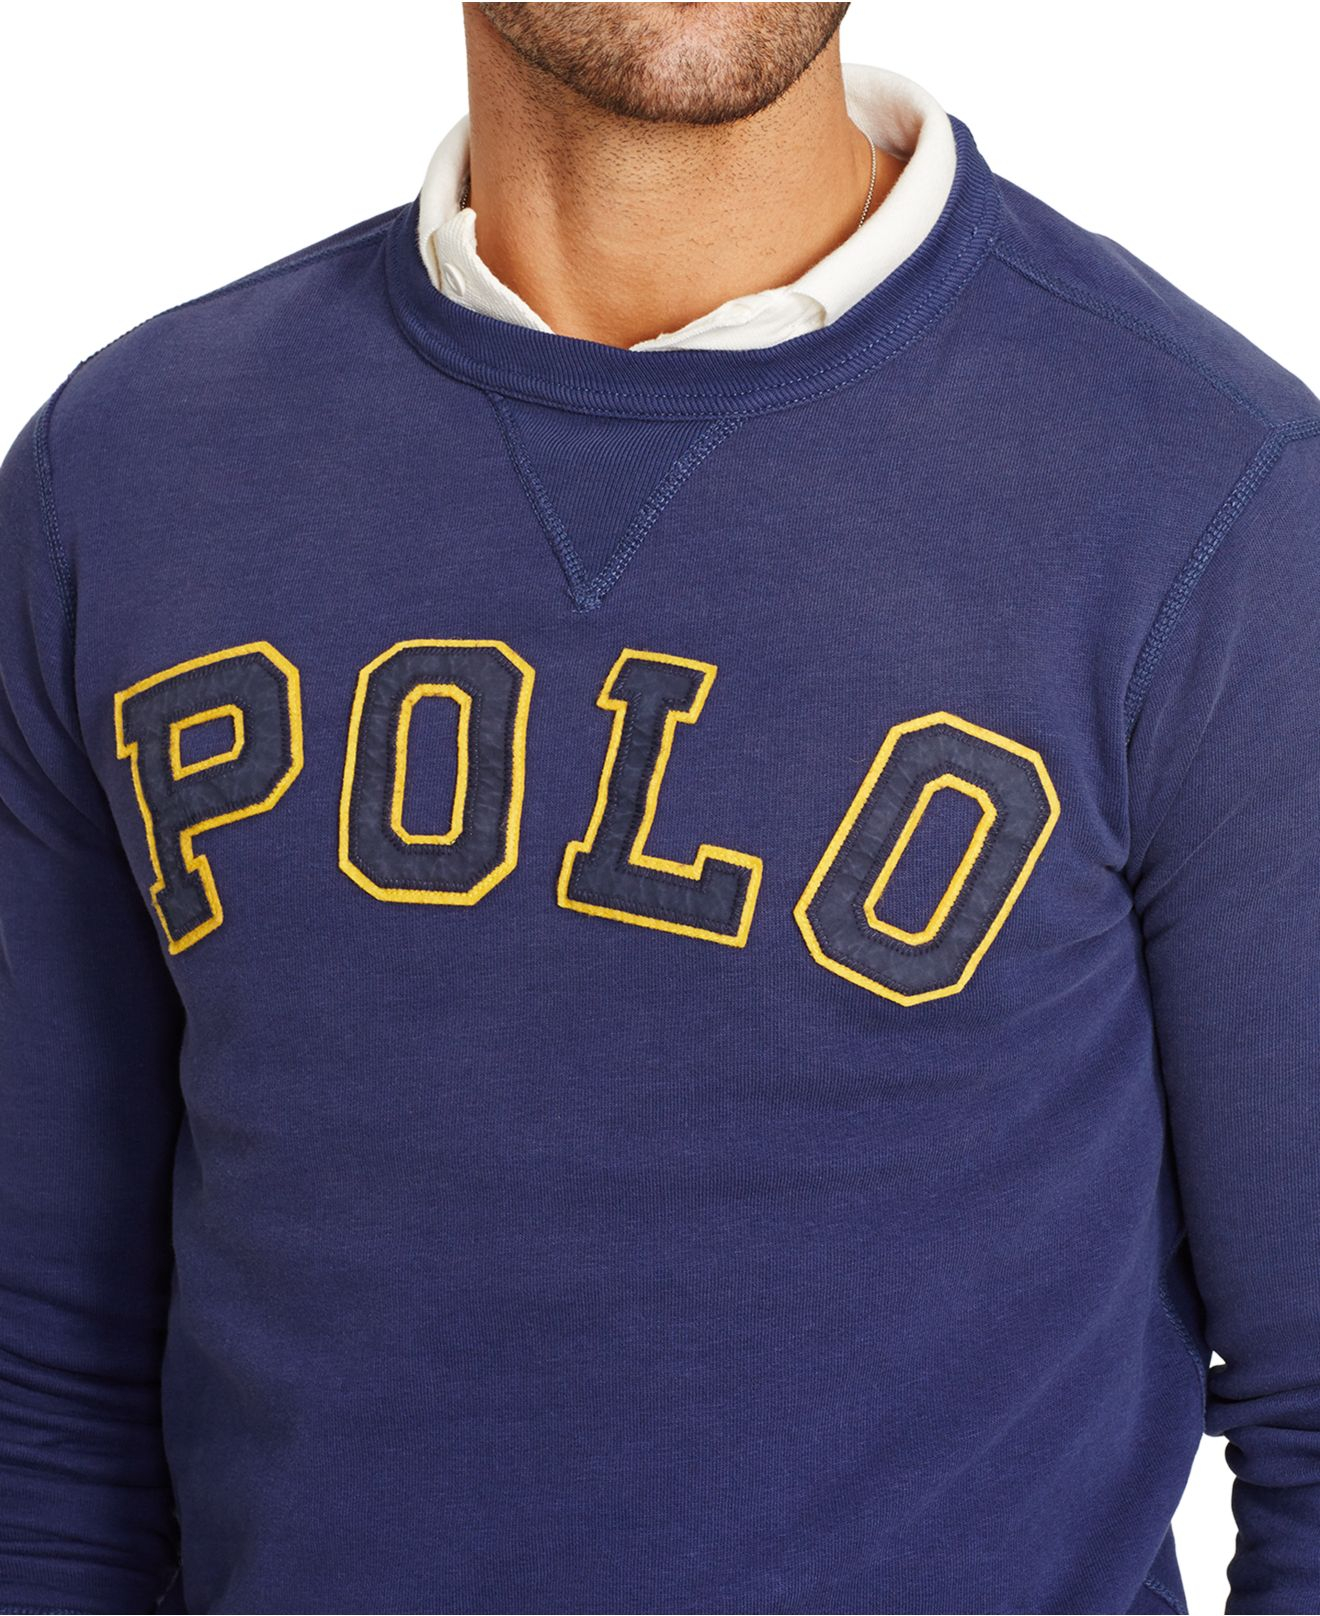 60d46dc9da1e Lyst - Polo Ralph Lauren Fleece Crewneck Sweatshirt in Blue for Men